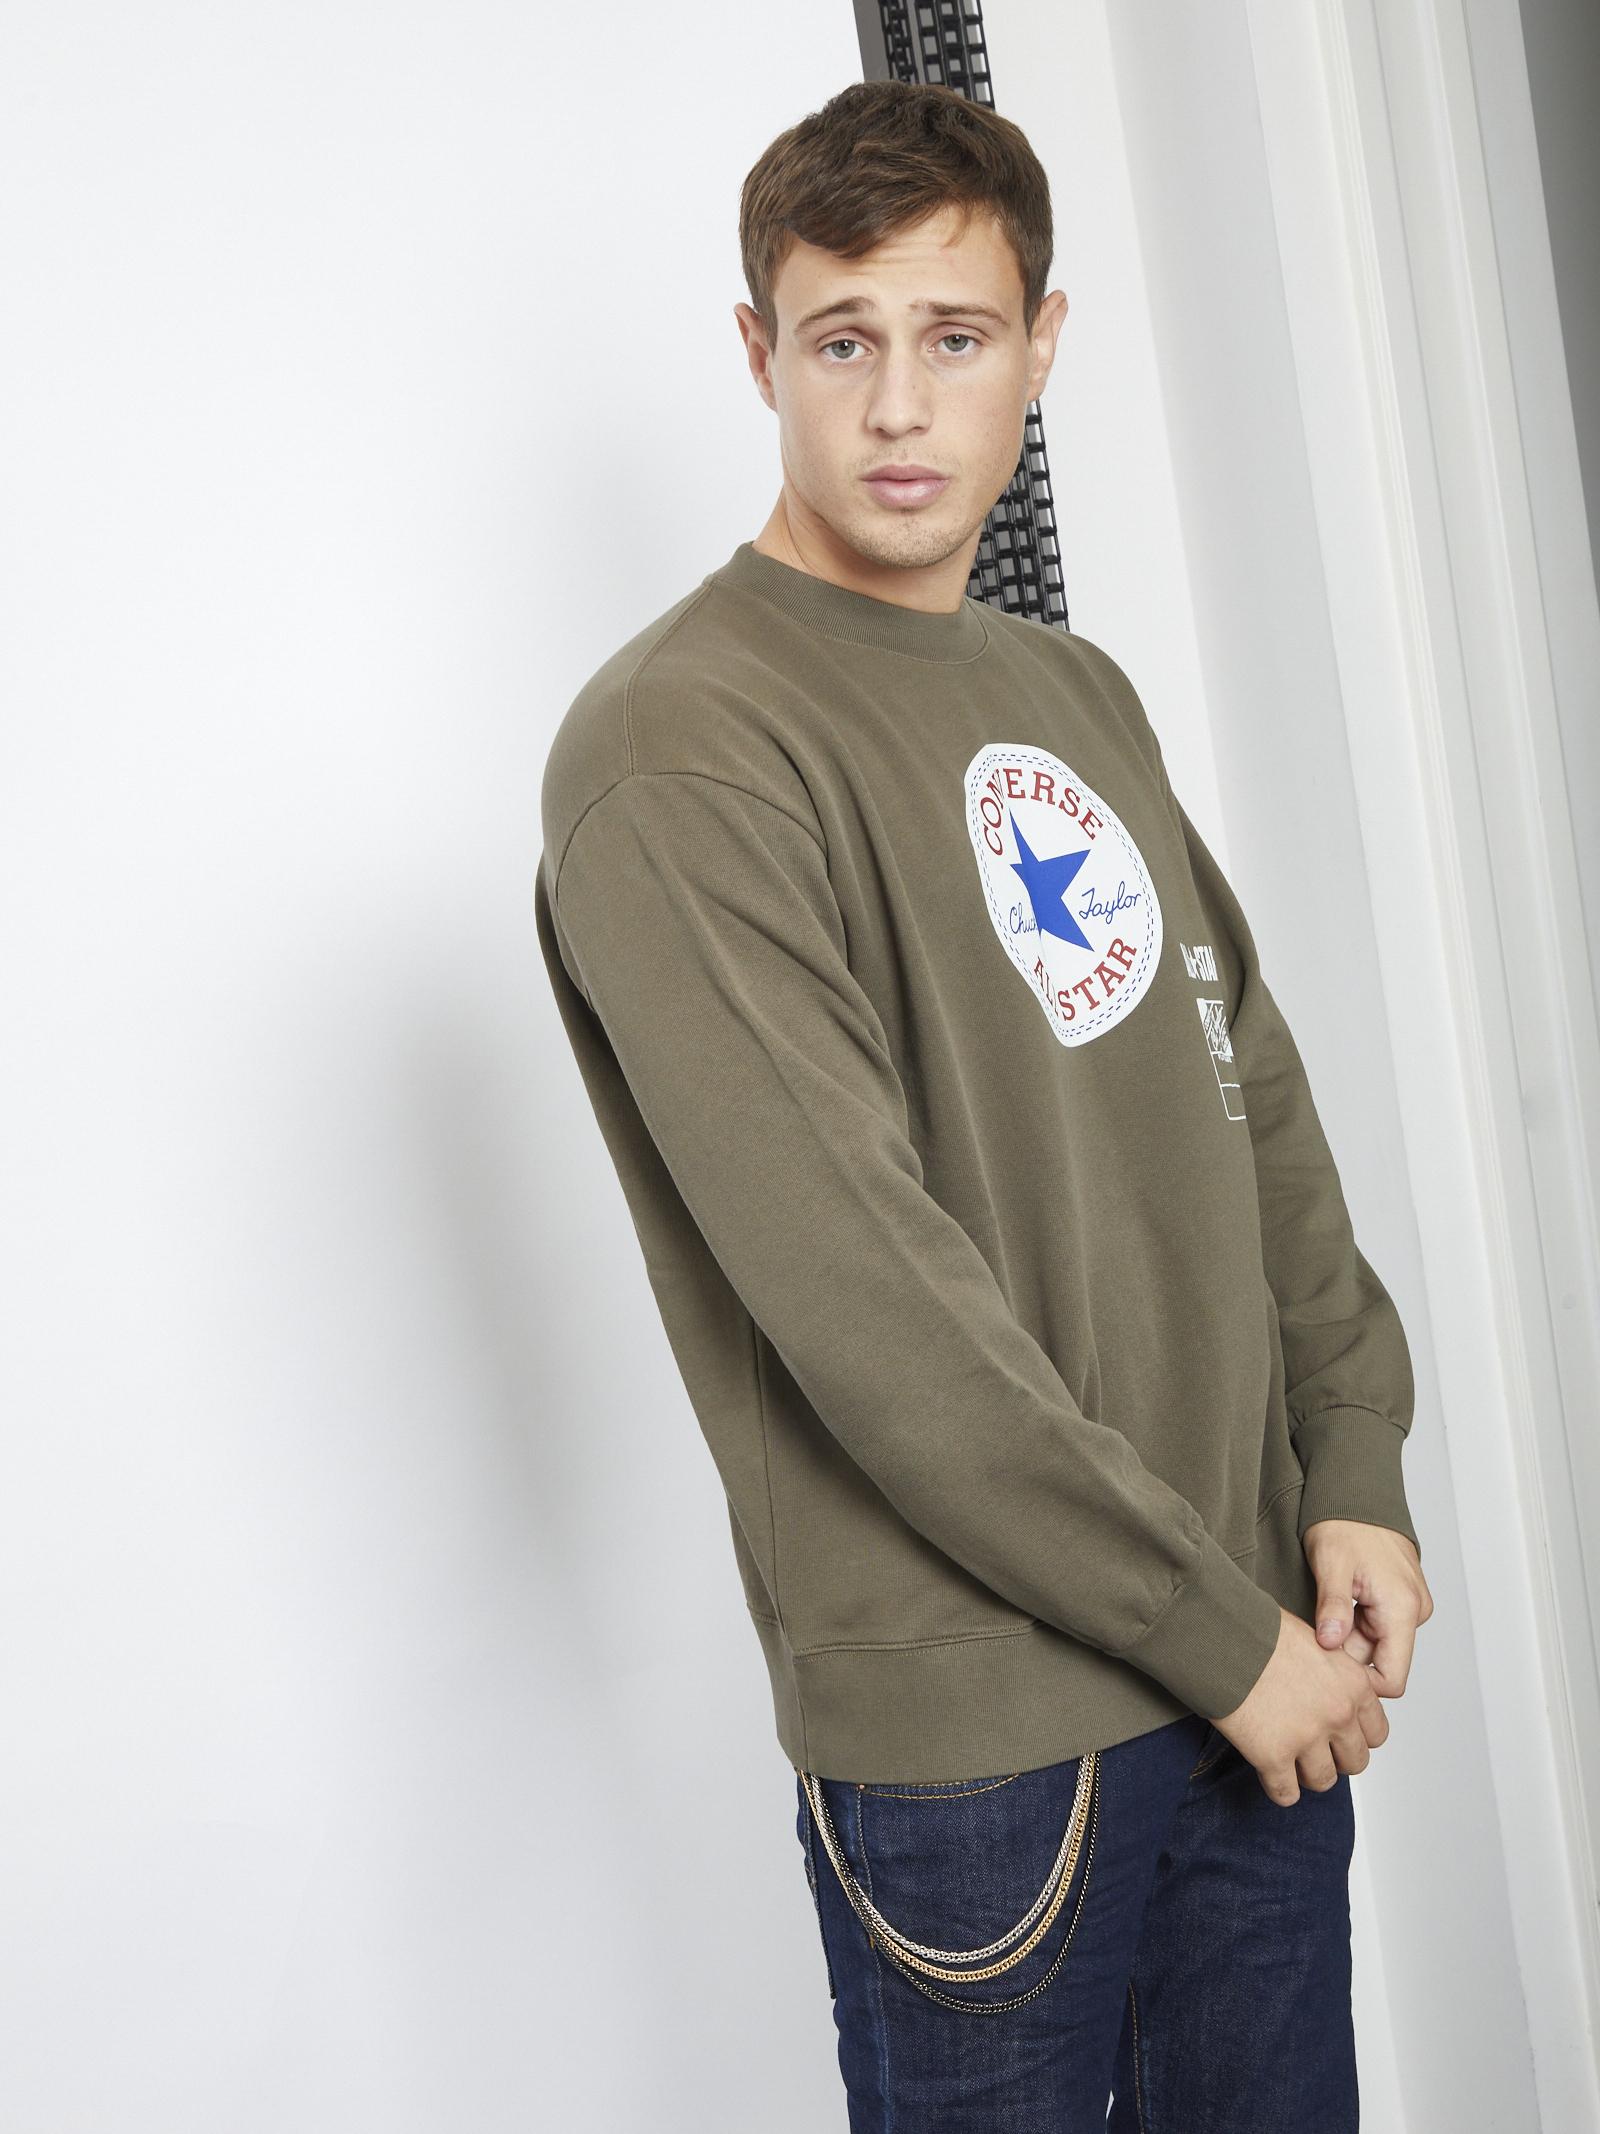 Sweater CONVERSE | Hoodies | 10021330MARRONE